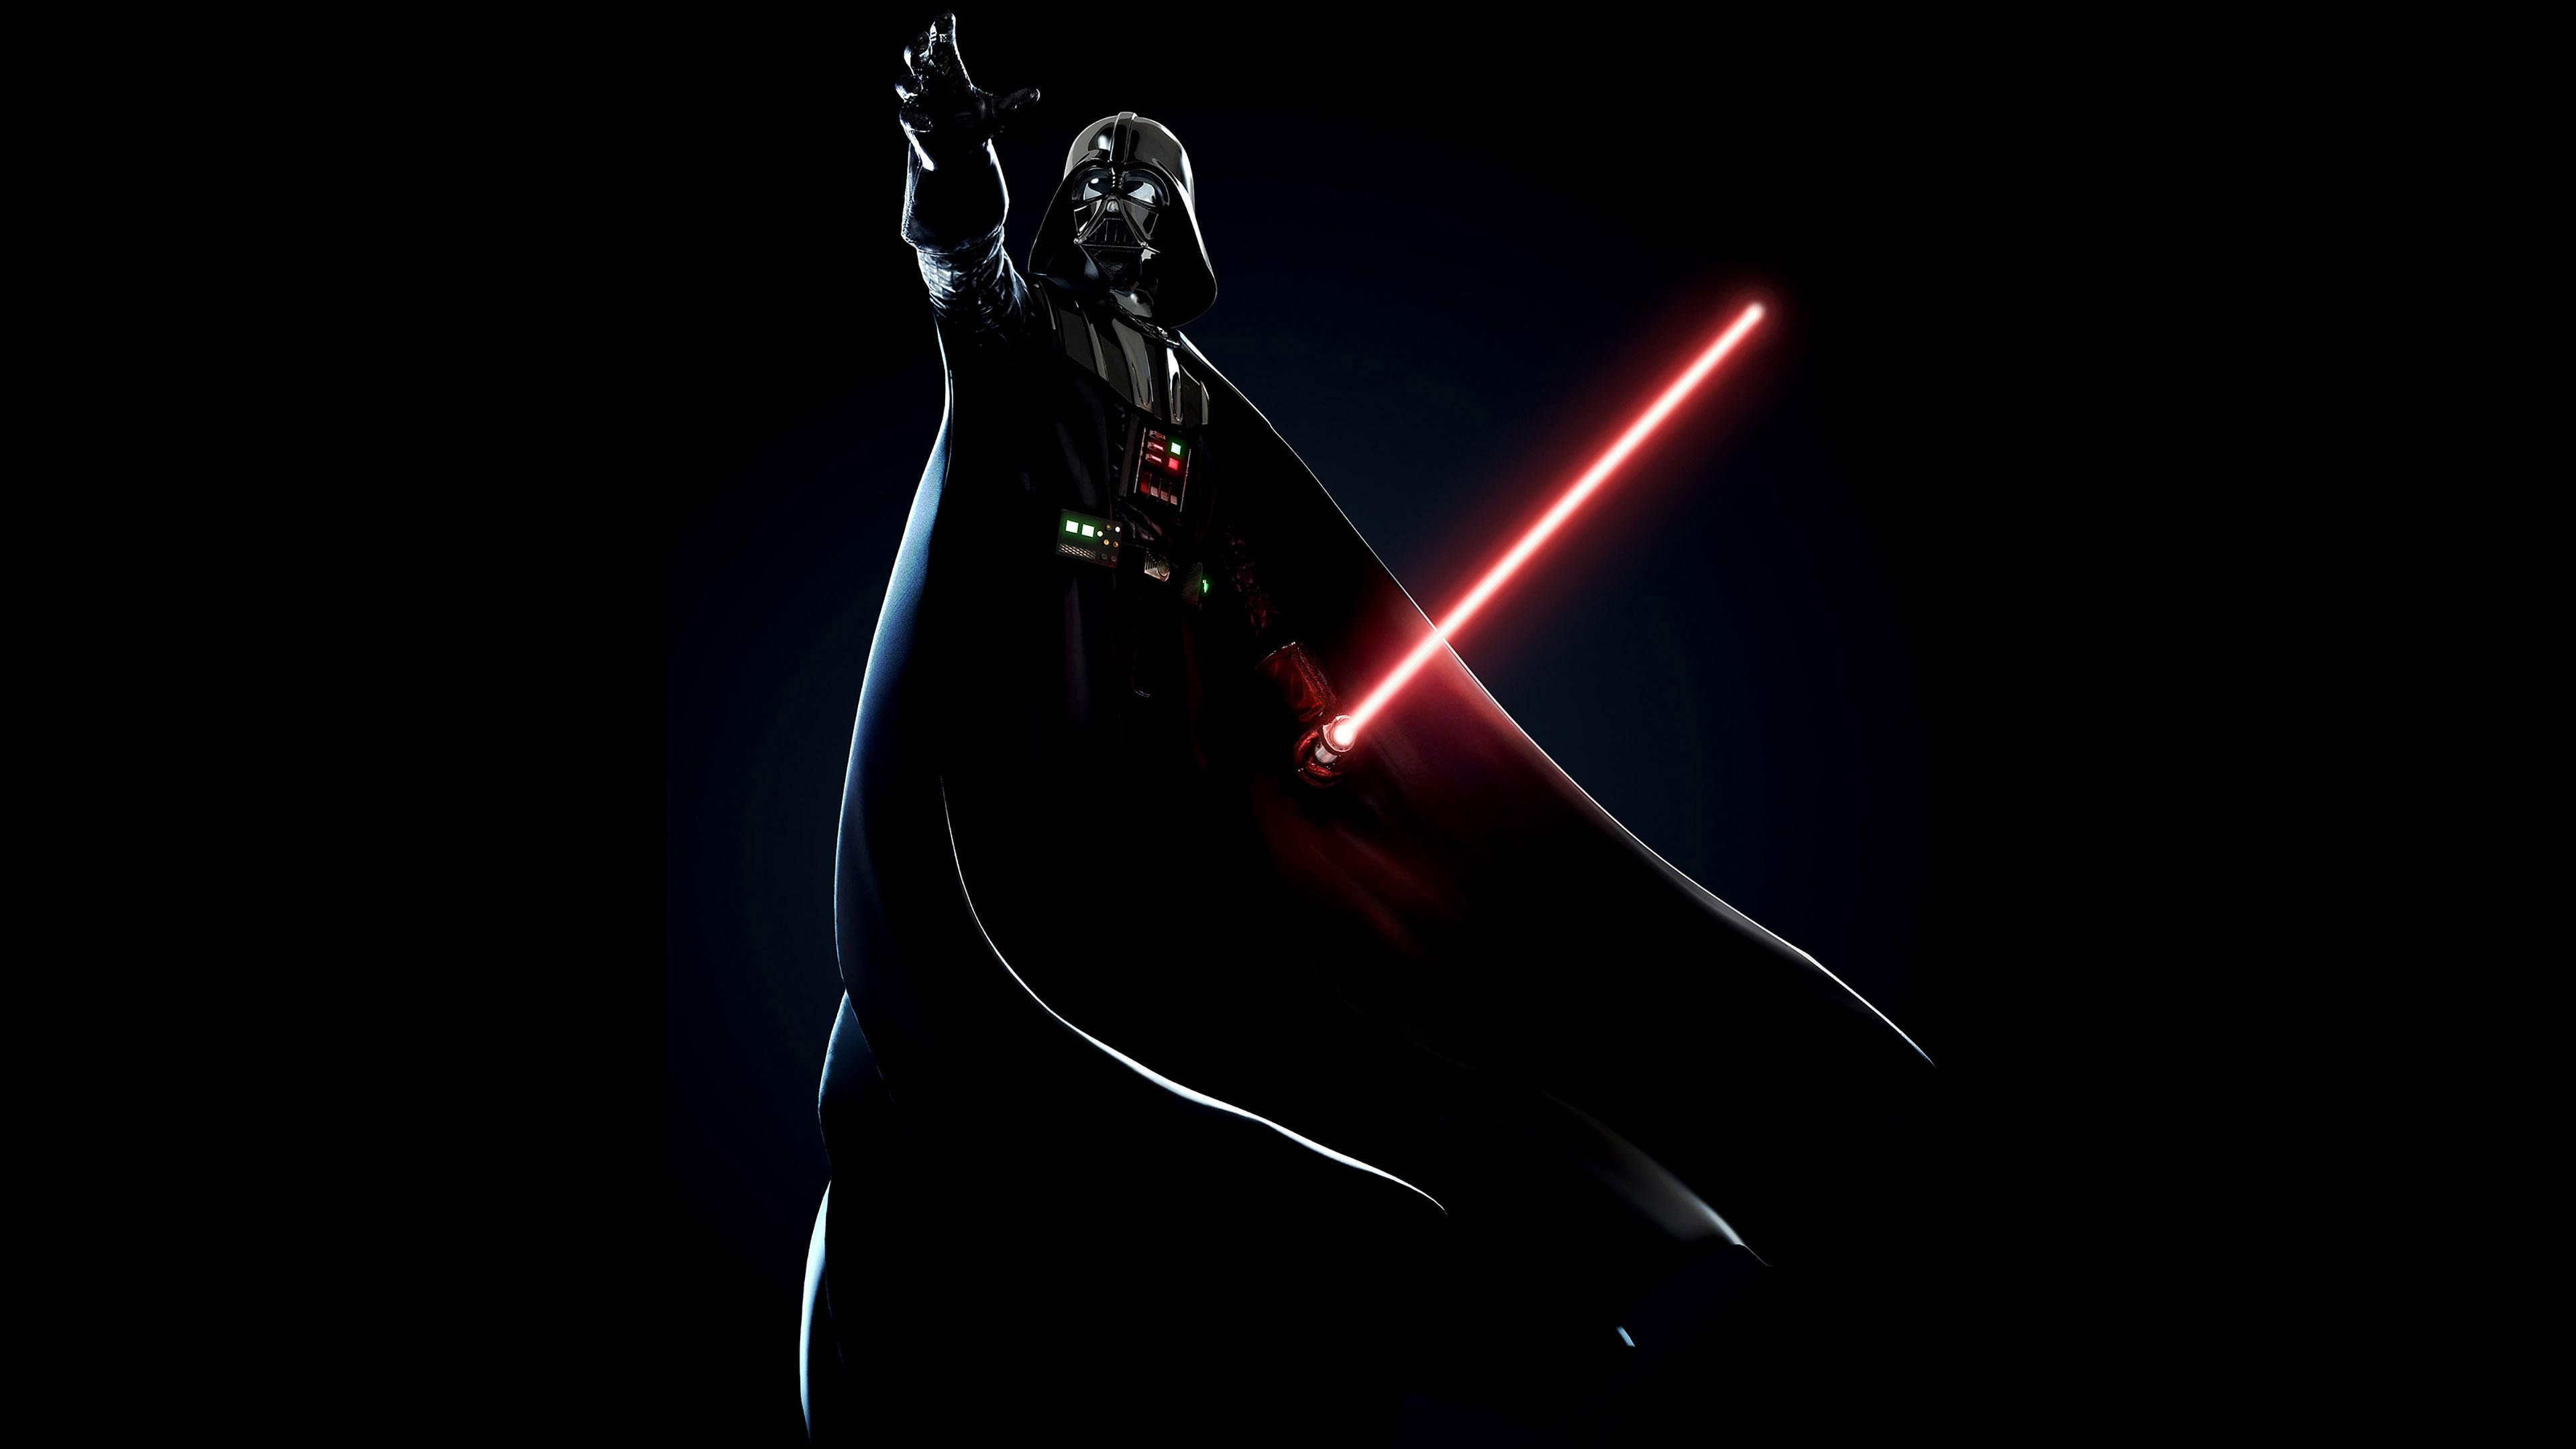 Darth Vader Wallpaper Iphone: 3840 X 2400